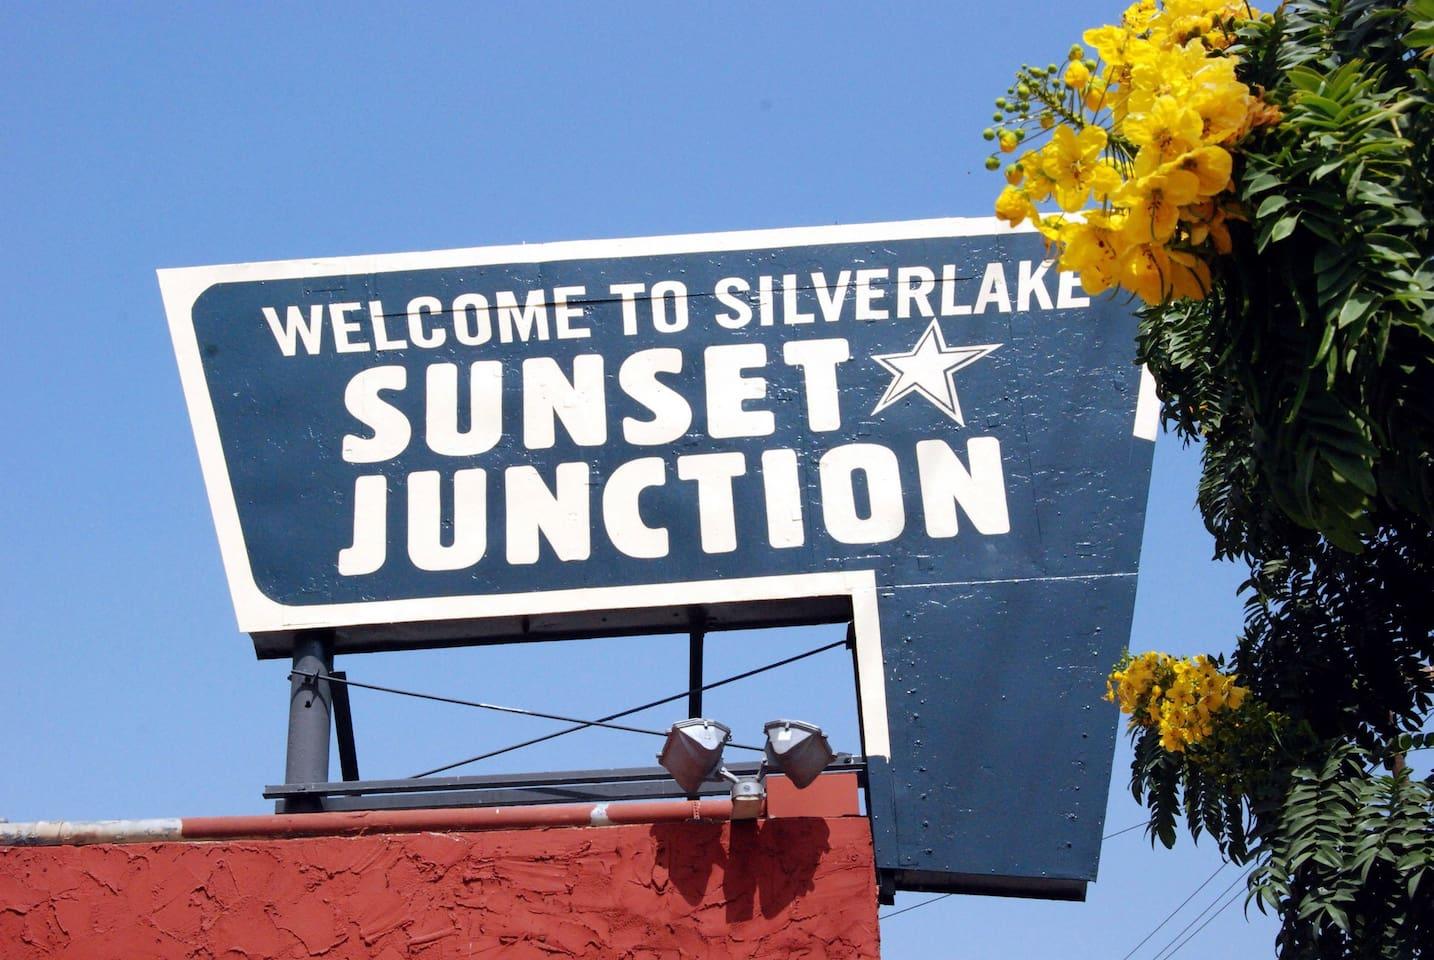 BEST Silverlake Location at $109